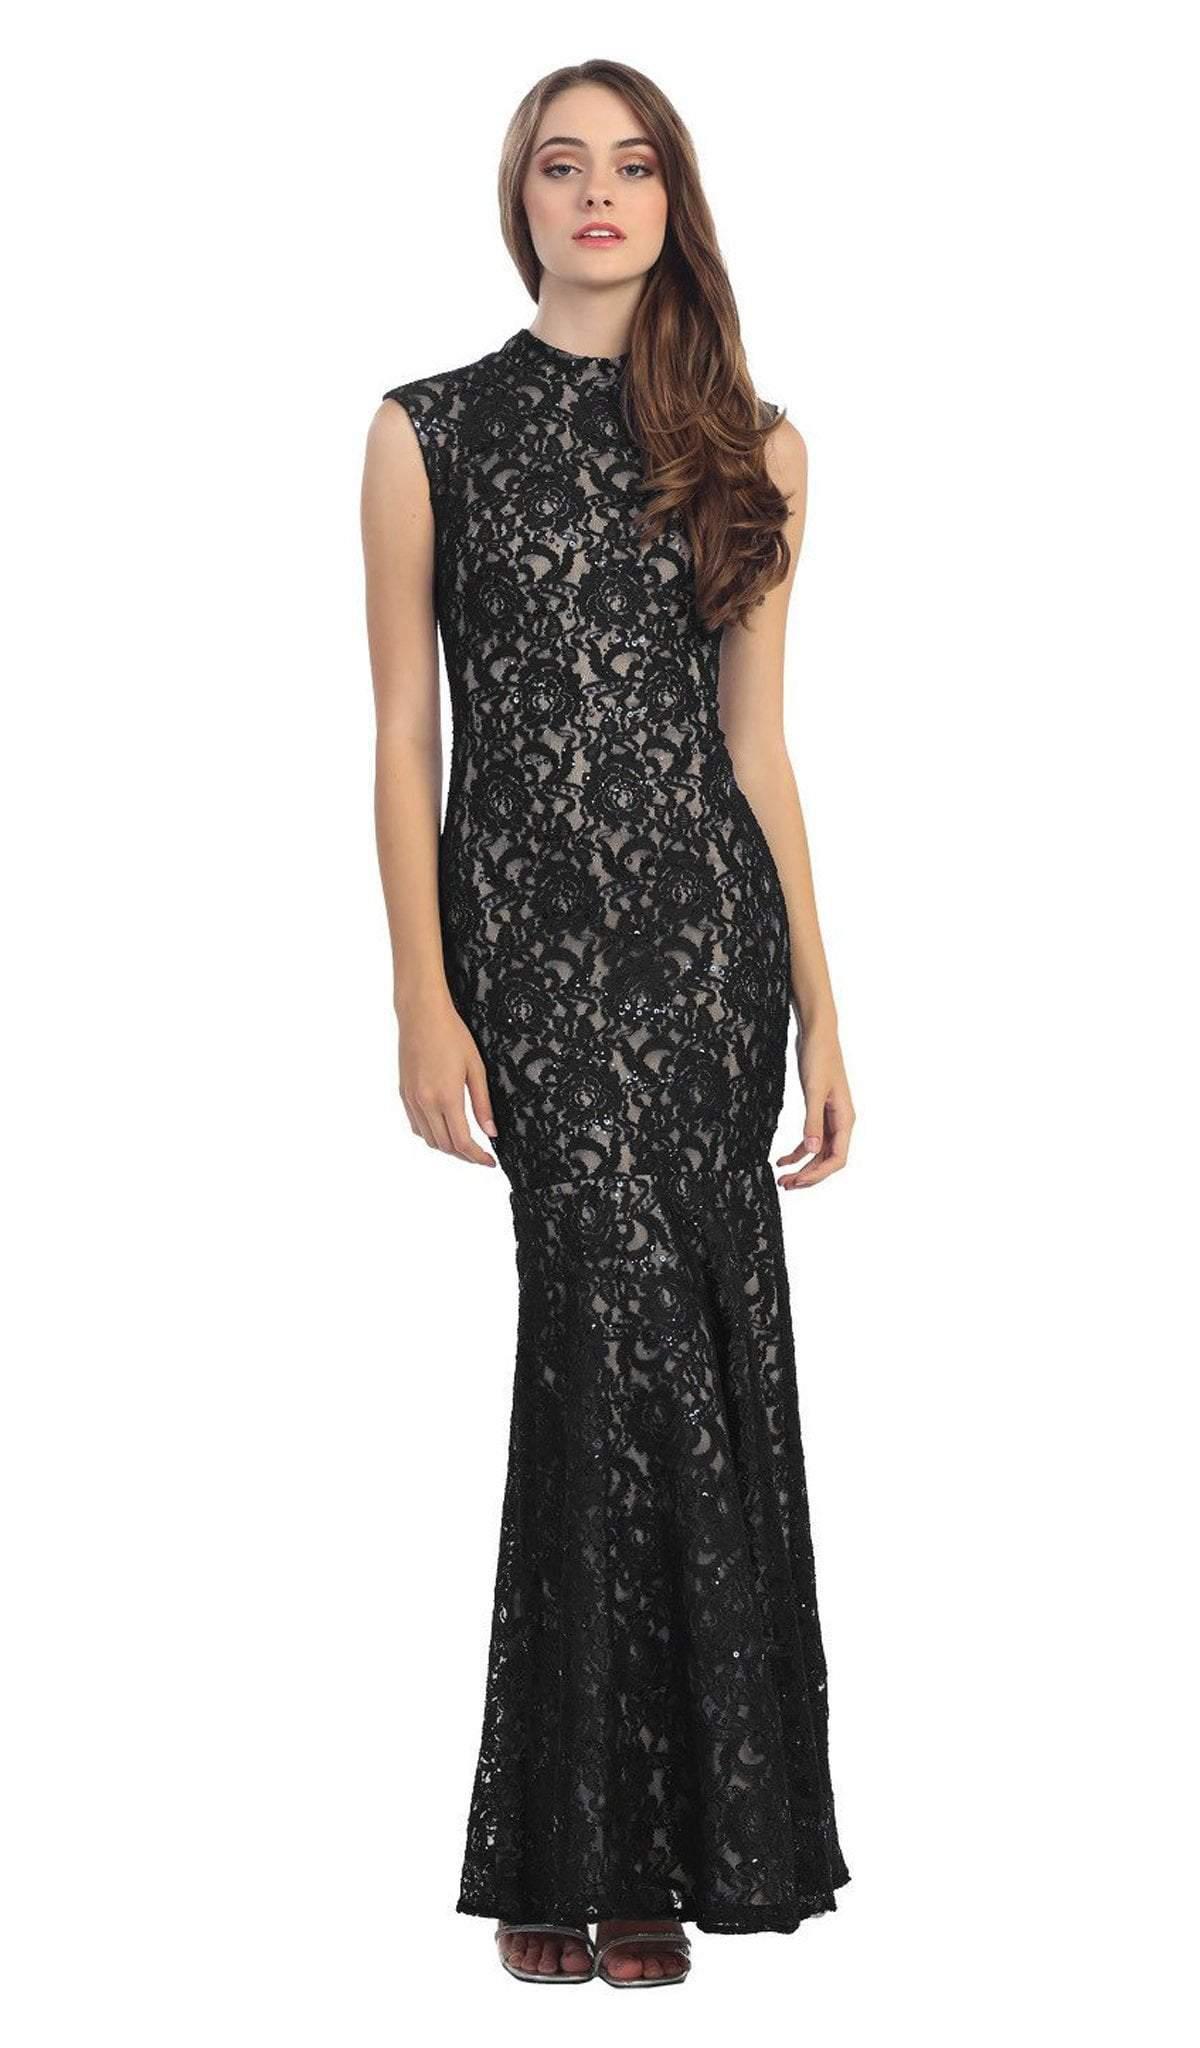 Eureka Fashion - 2061 Allover Lace High Neckline Mermaid Dress